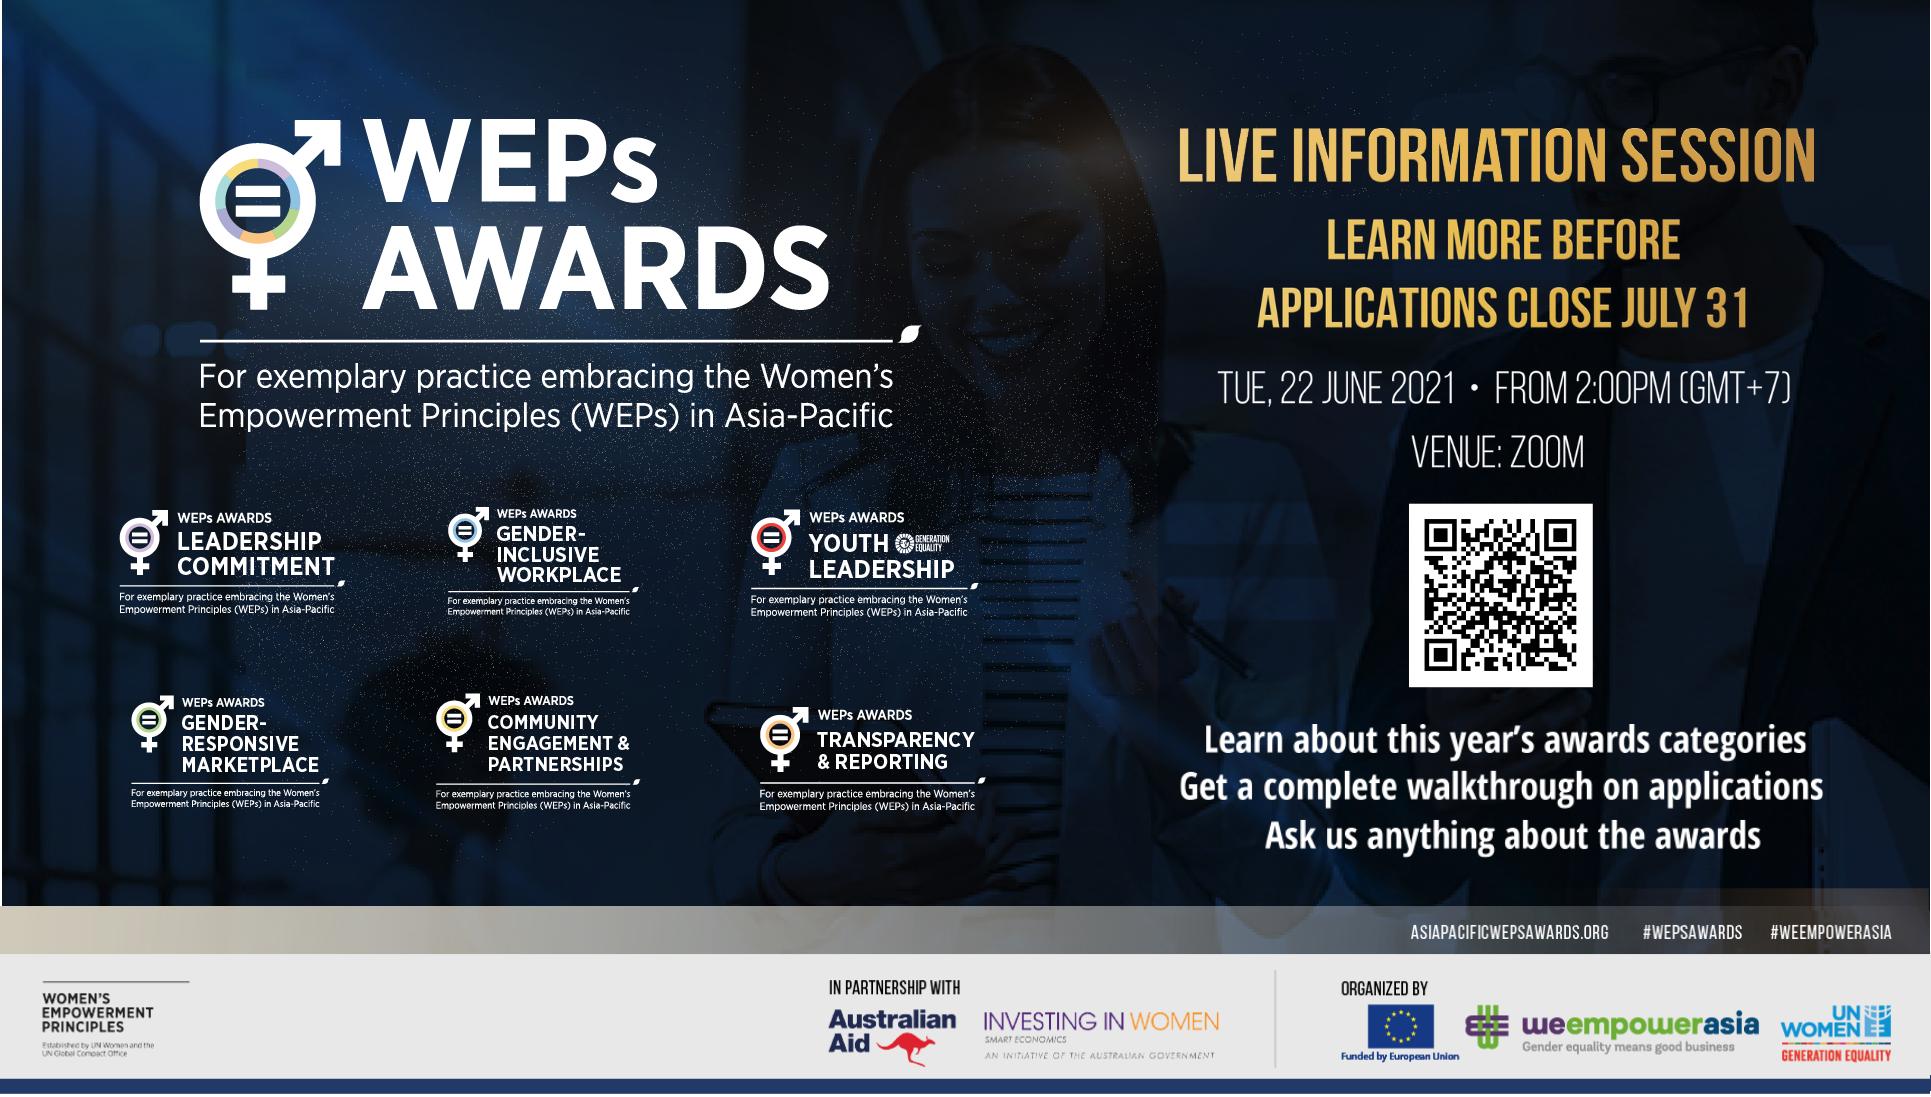 The Women's Empowerment Principles Awards 2021